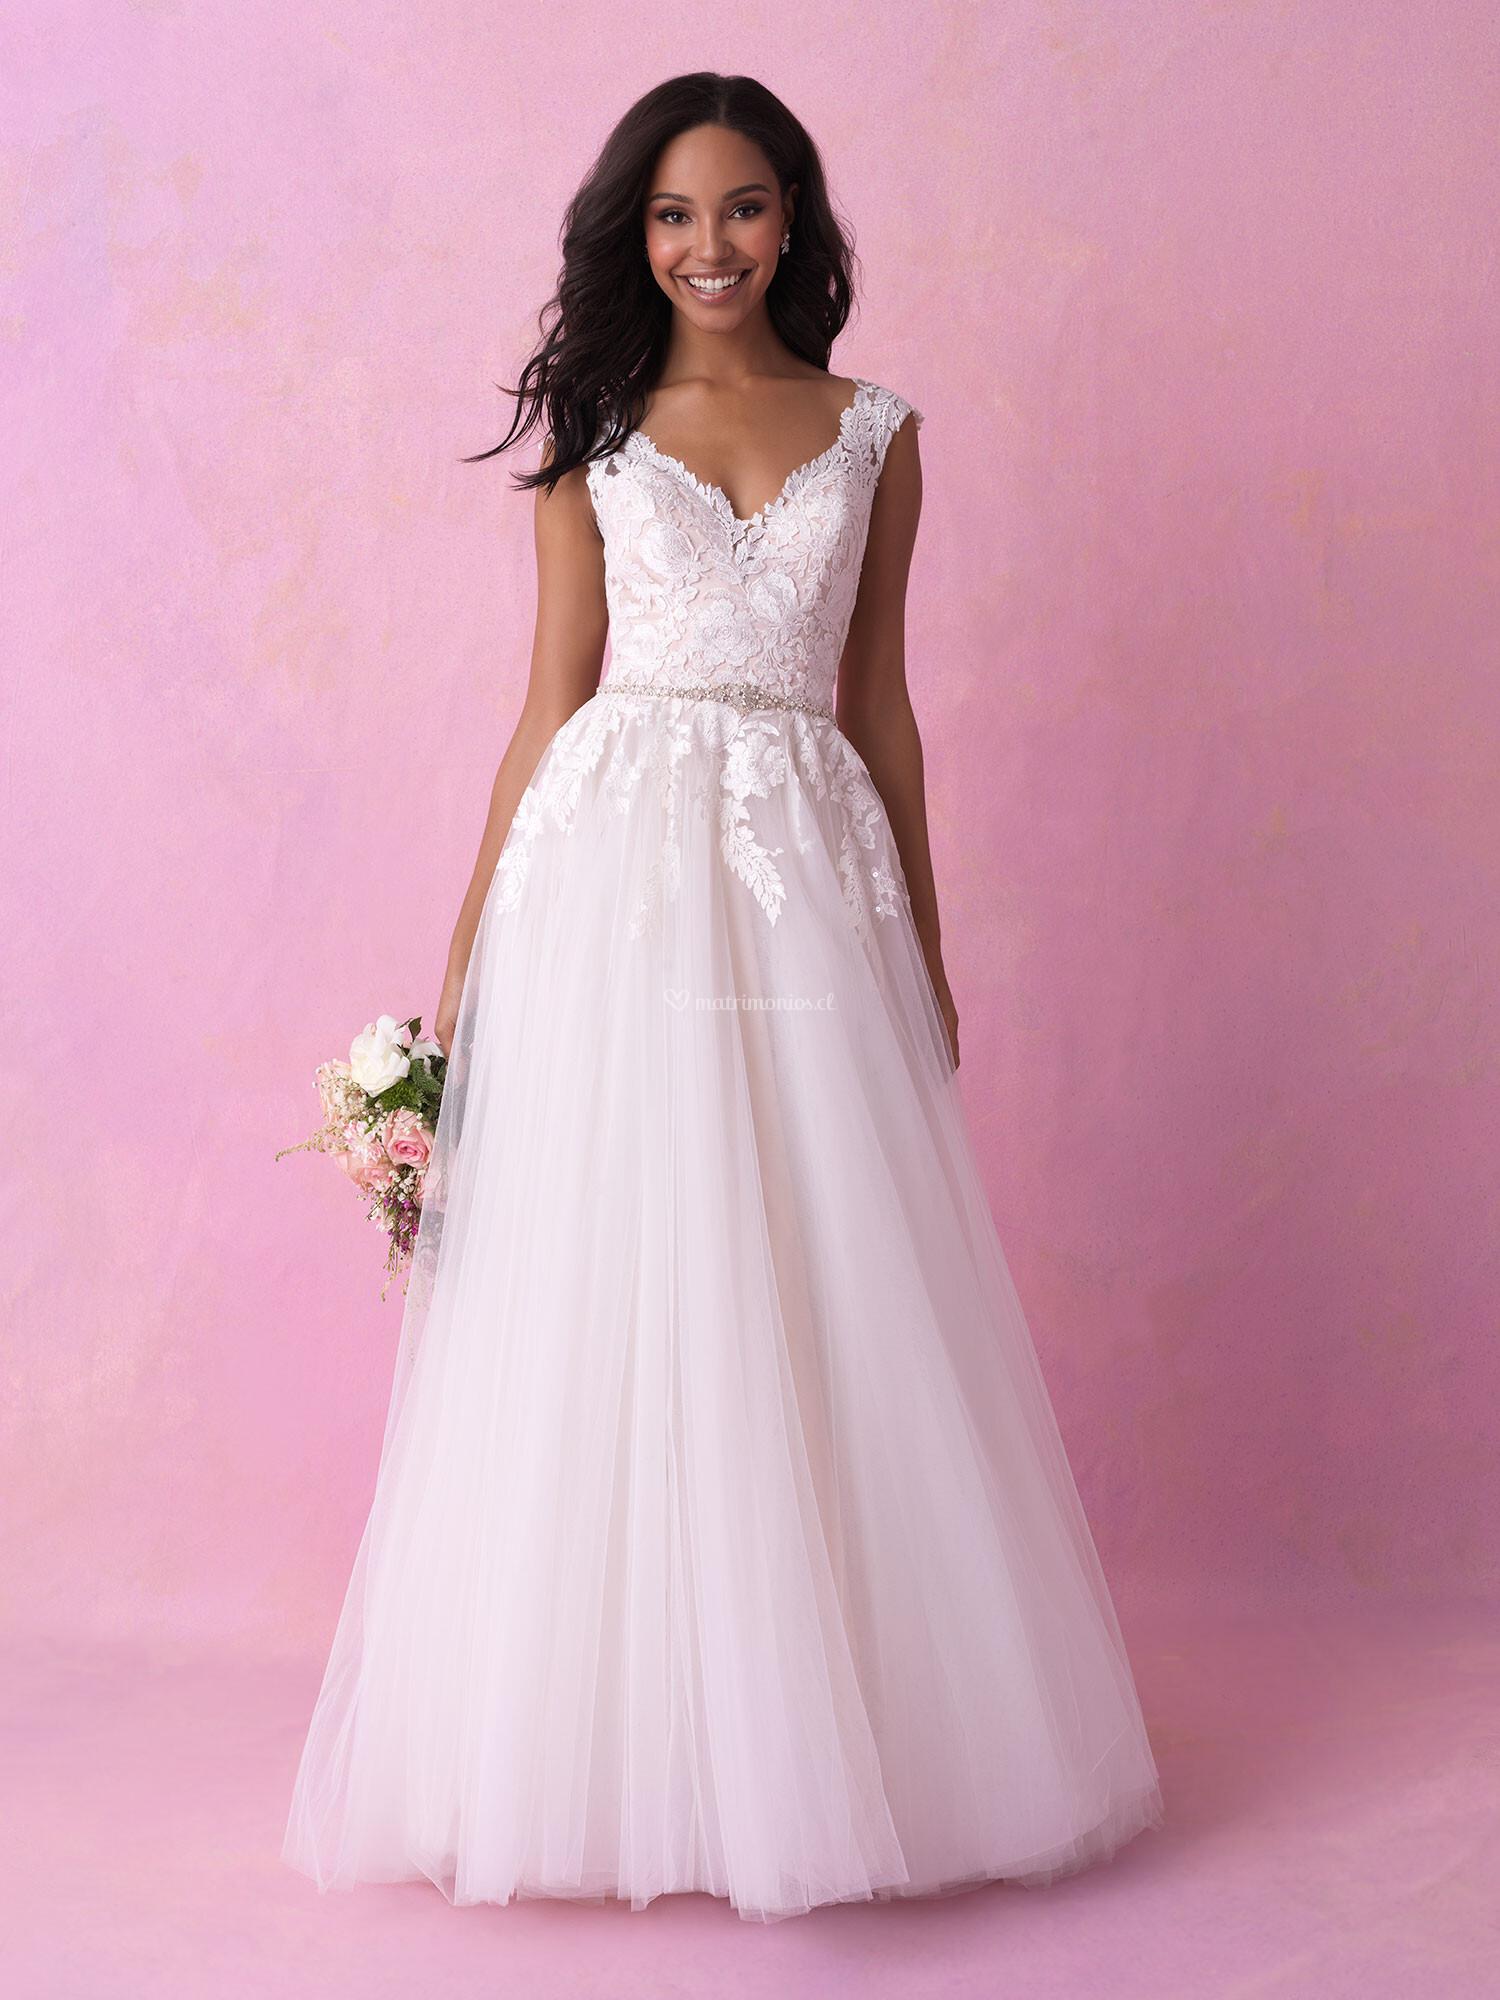 Vestidos de Novia de Allure Bridals - Matrimonios.cl